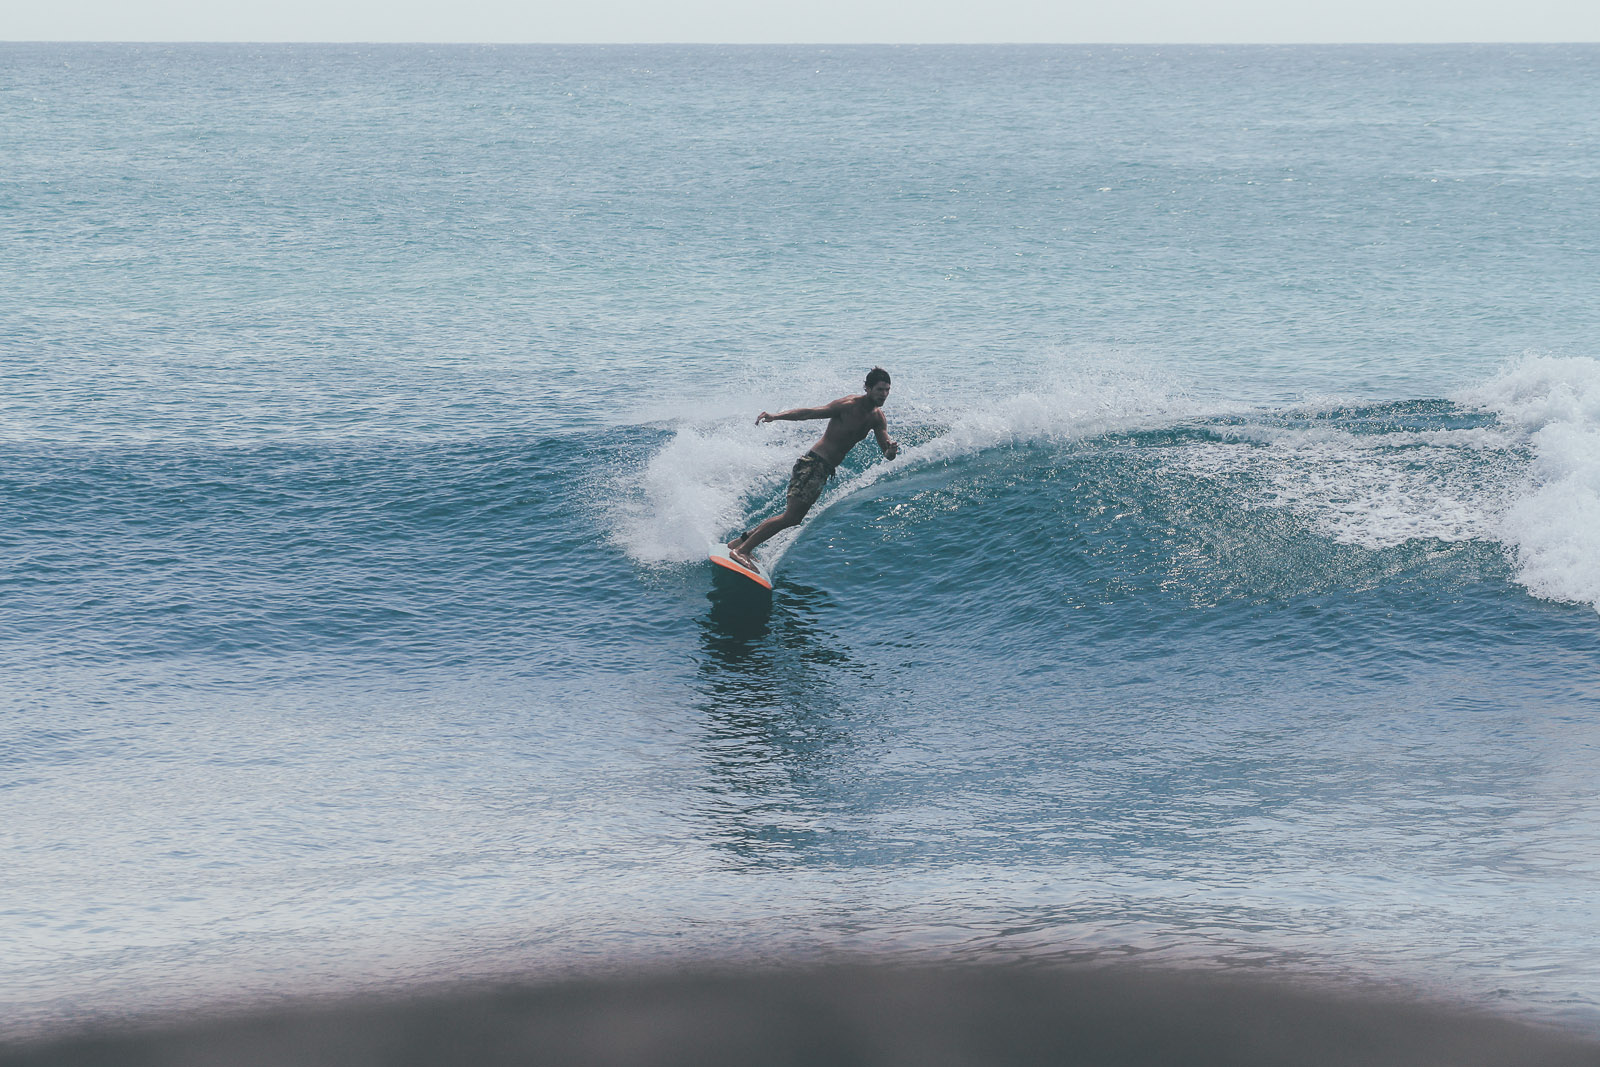 Sunshinestories-surf-travel-blog-IMG_8183